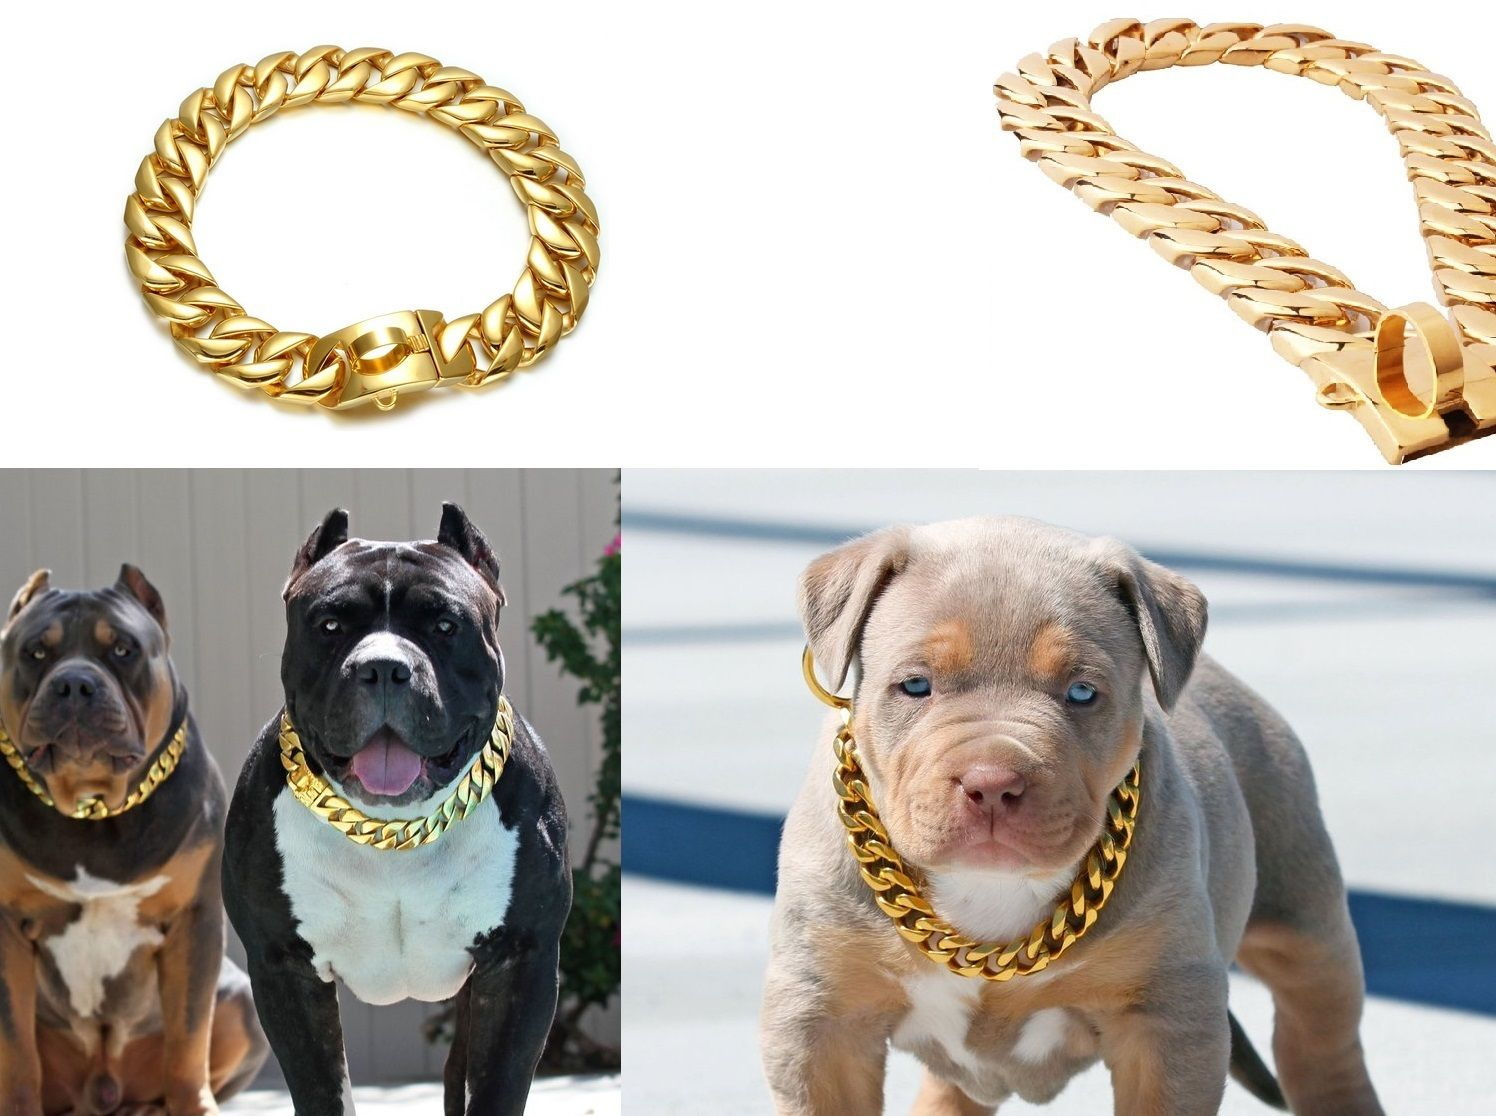 Cuban dog collar chain dogs big dogs pet collars